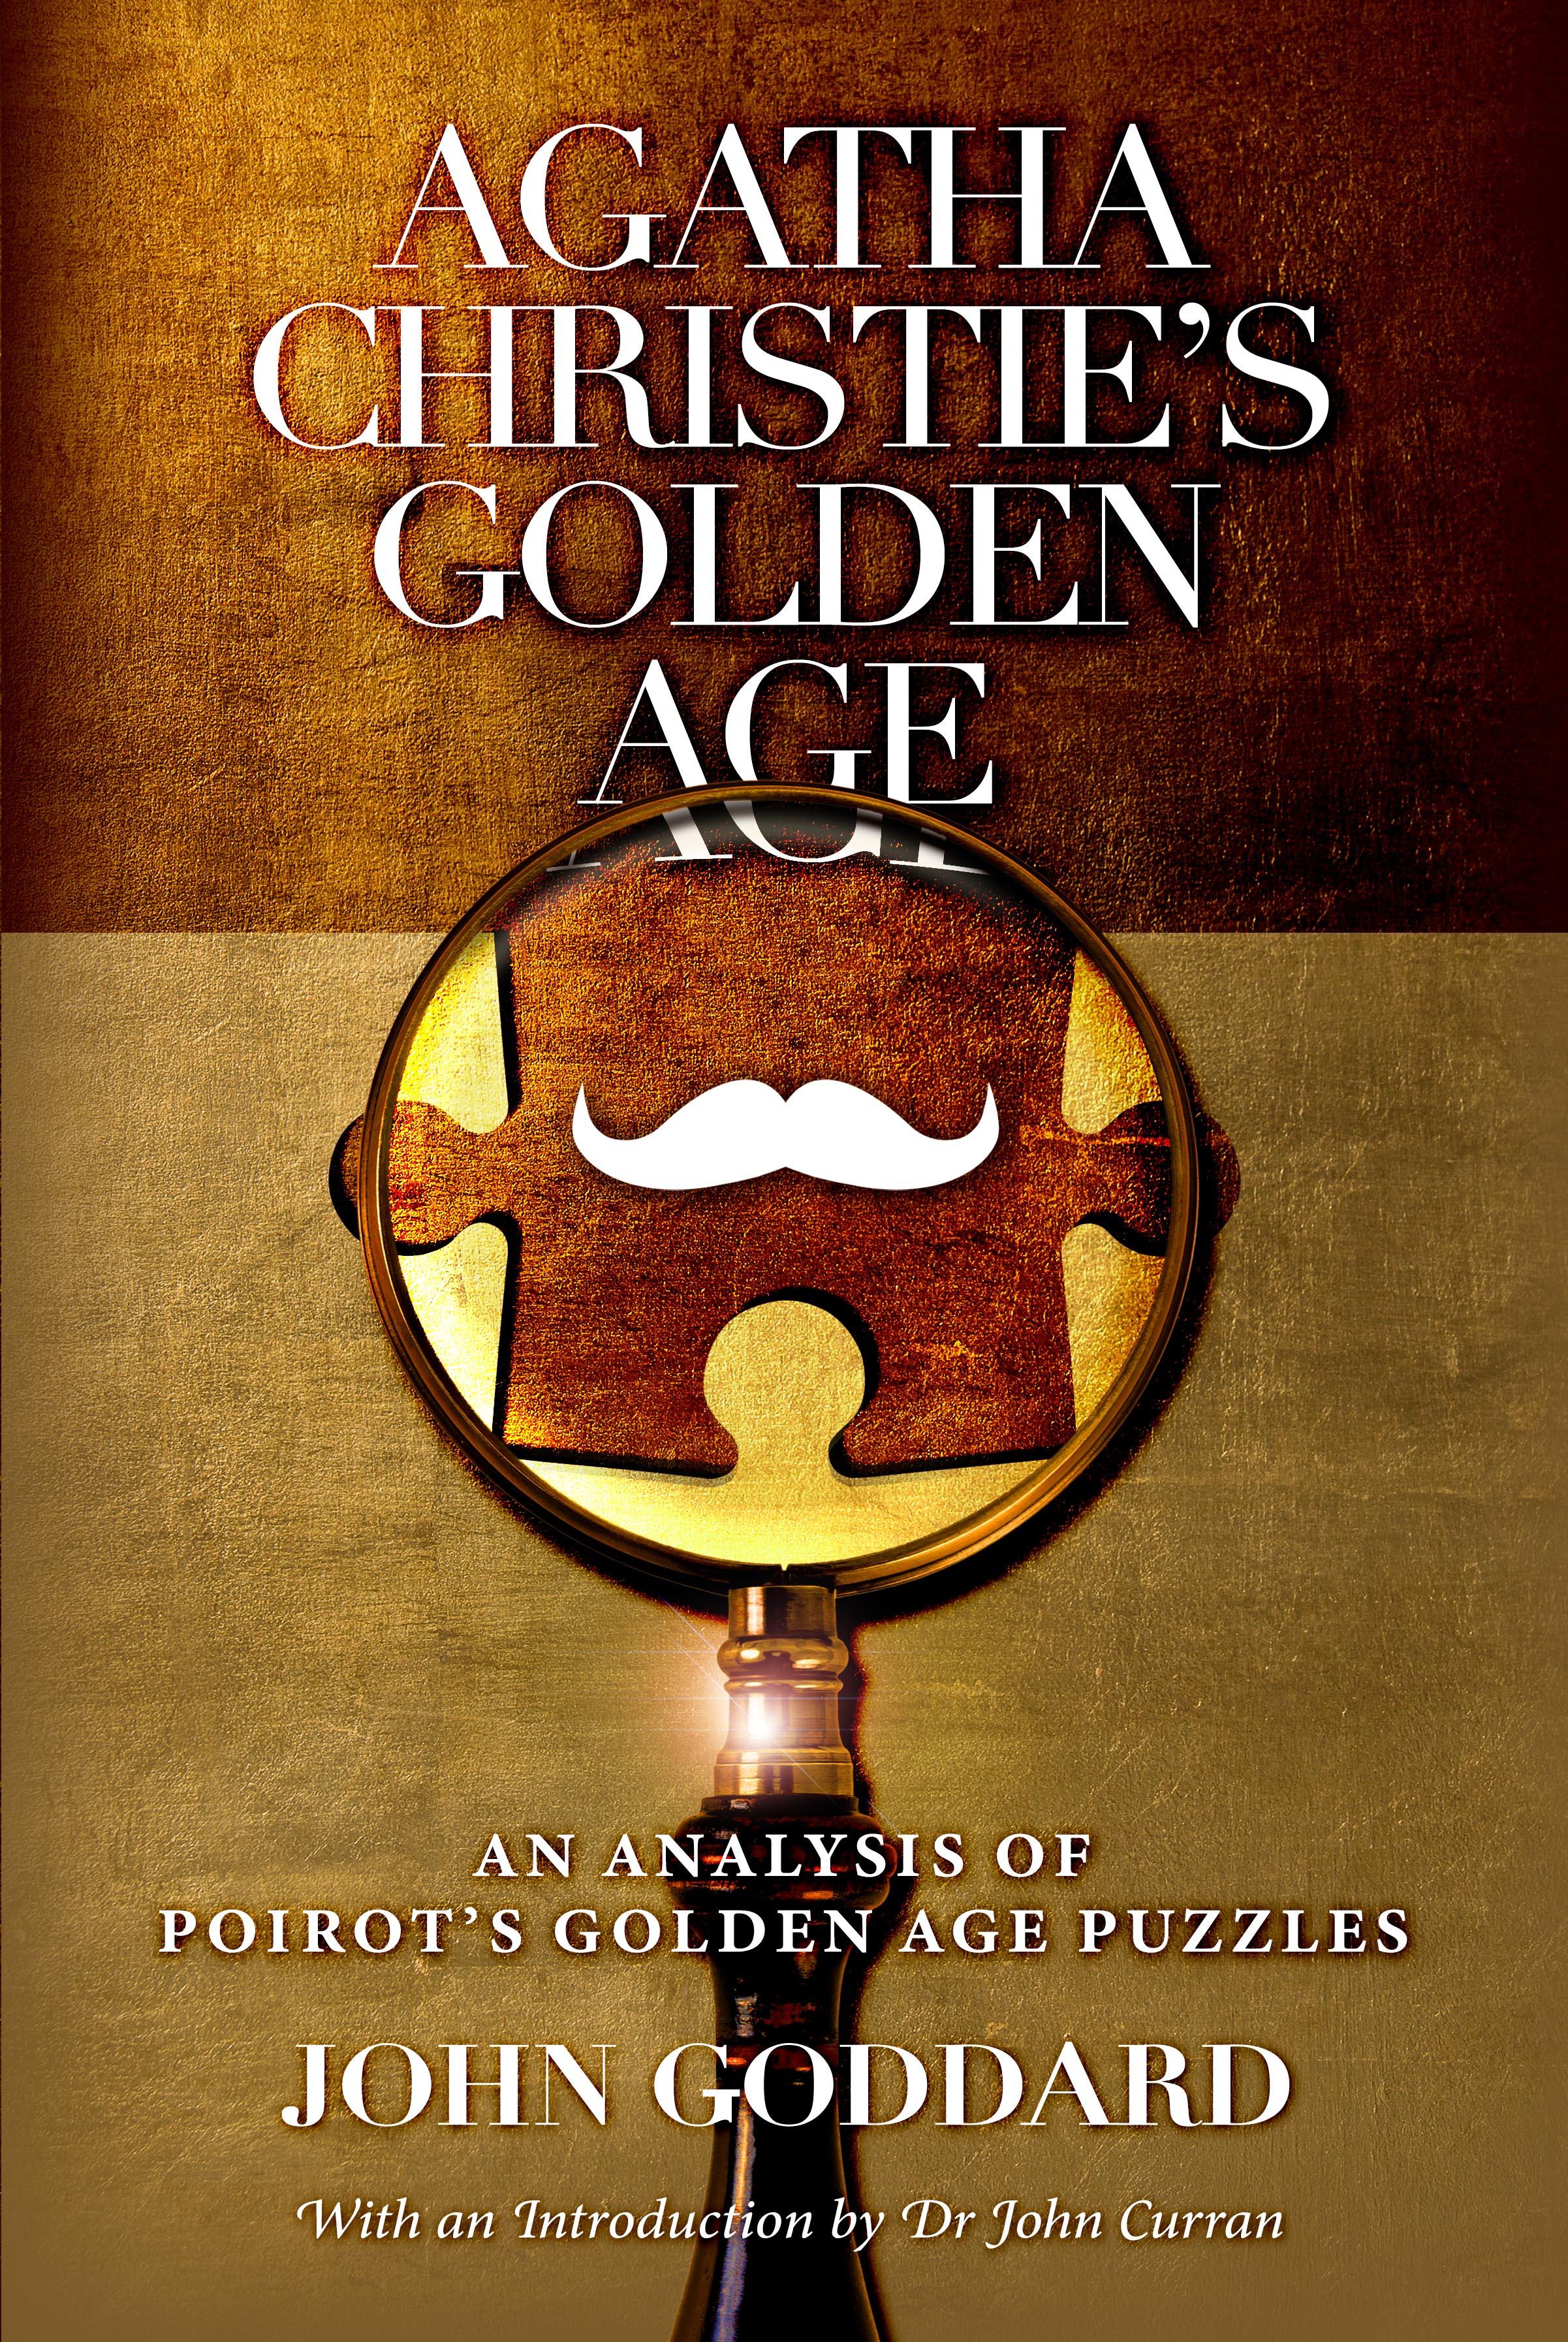 Agatha Christie's Golden Age: John Goddard talks to Crime Time